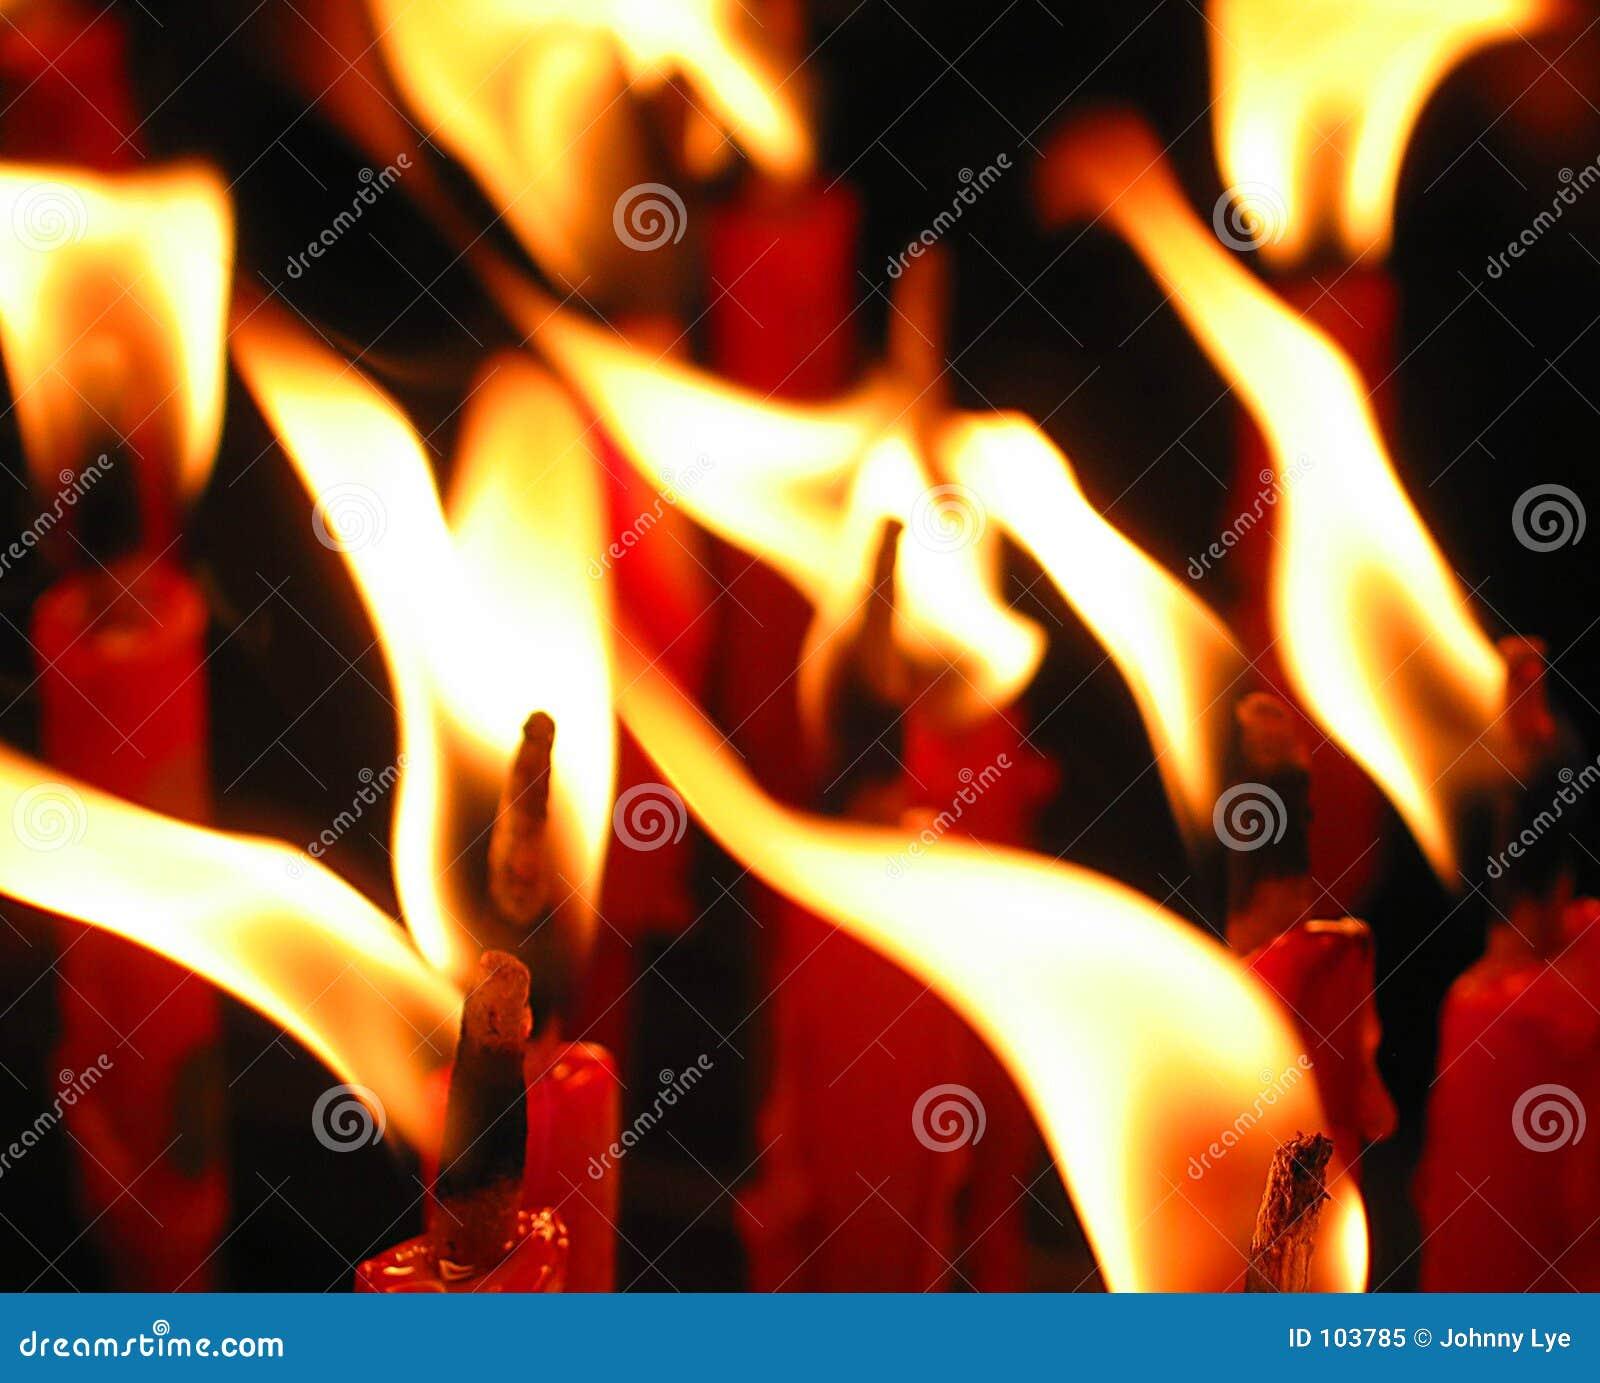 Flama de vela